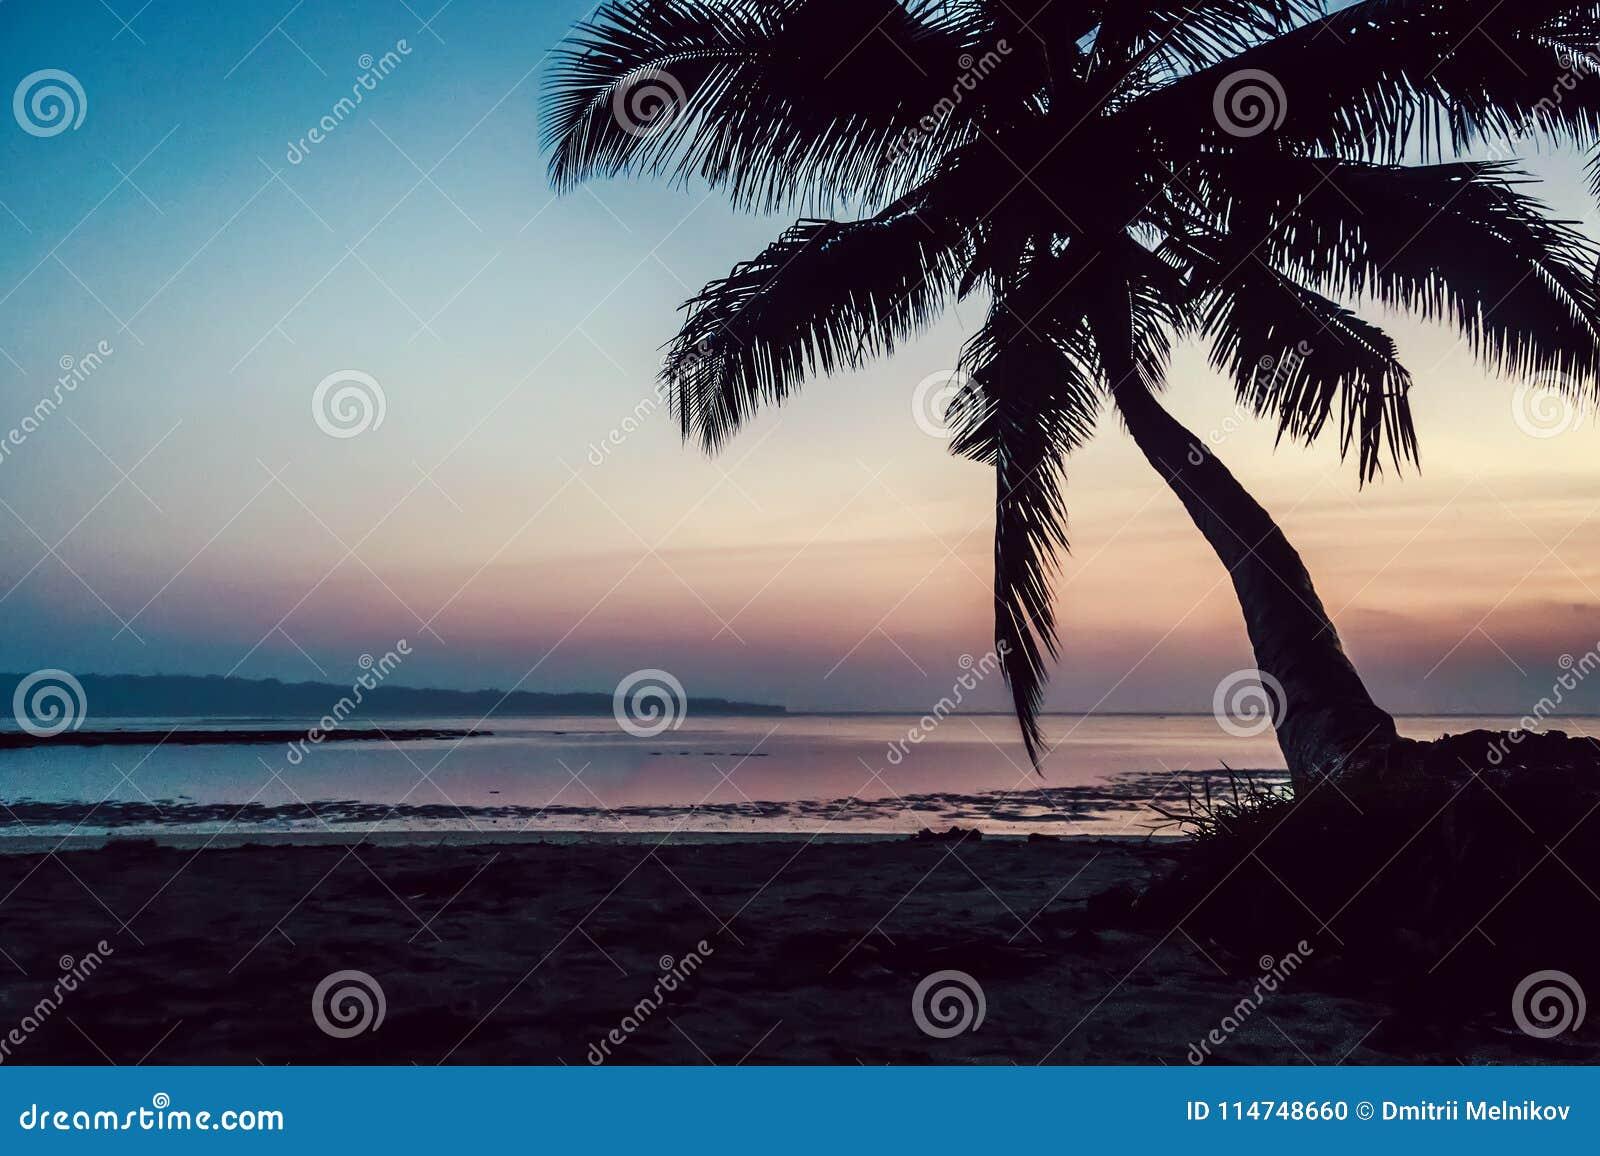 Tropical Beach Background At Sunset Sunrise Stock Photo